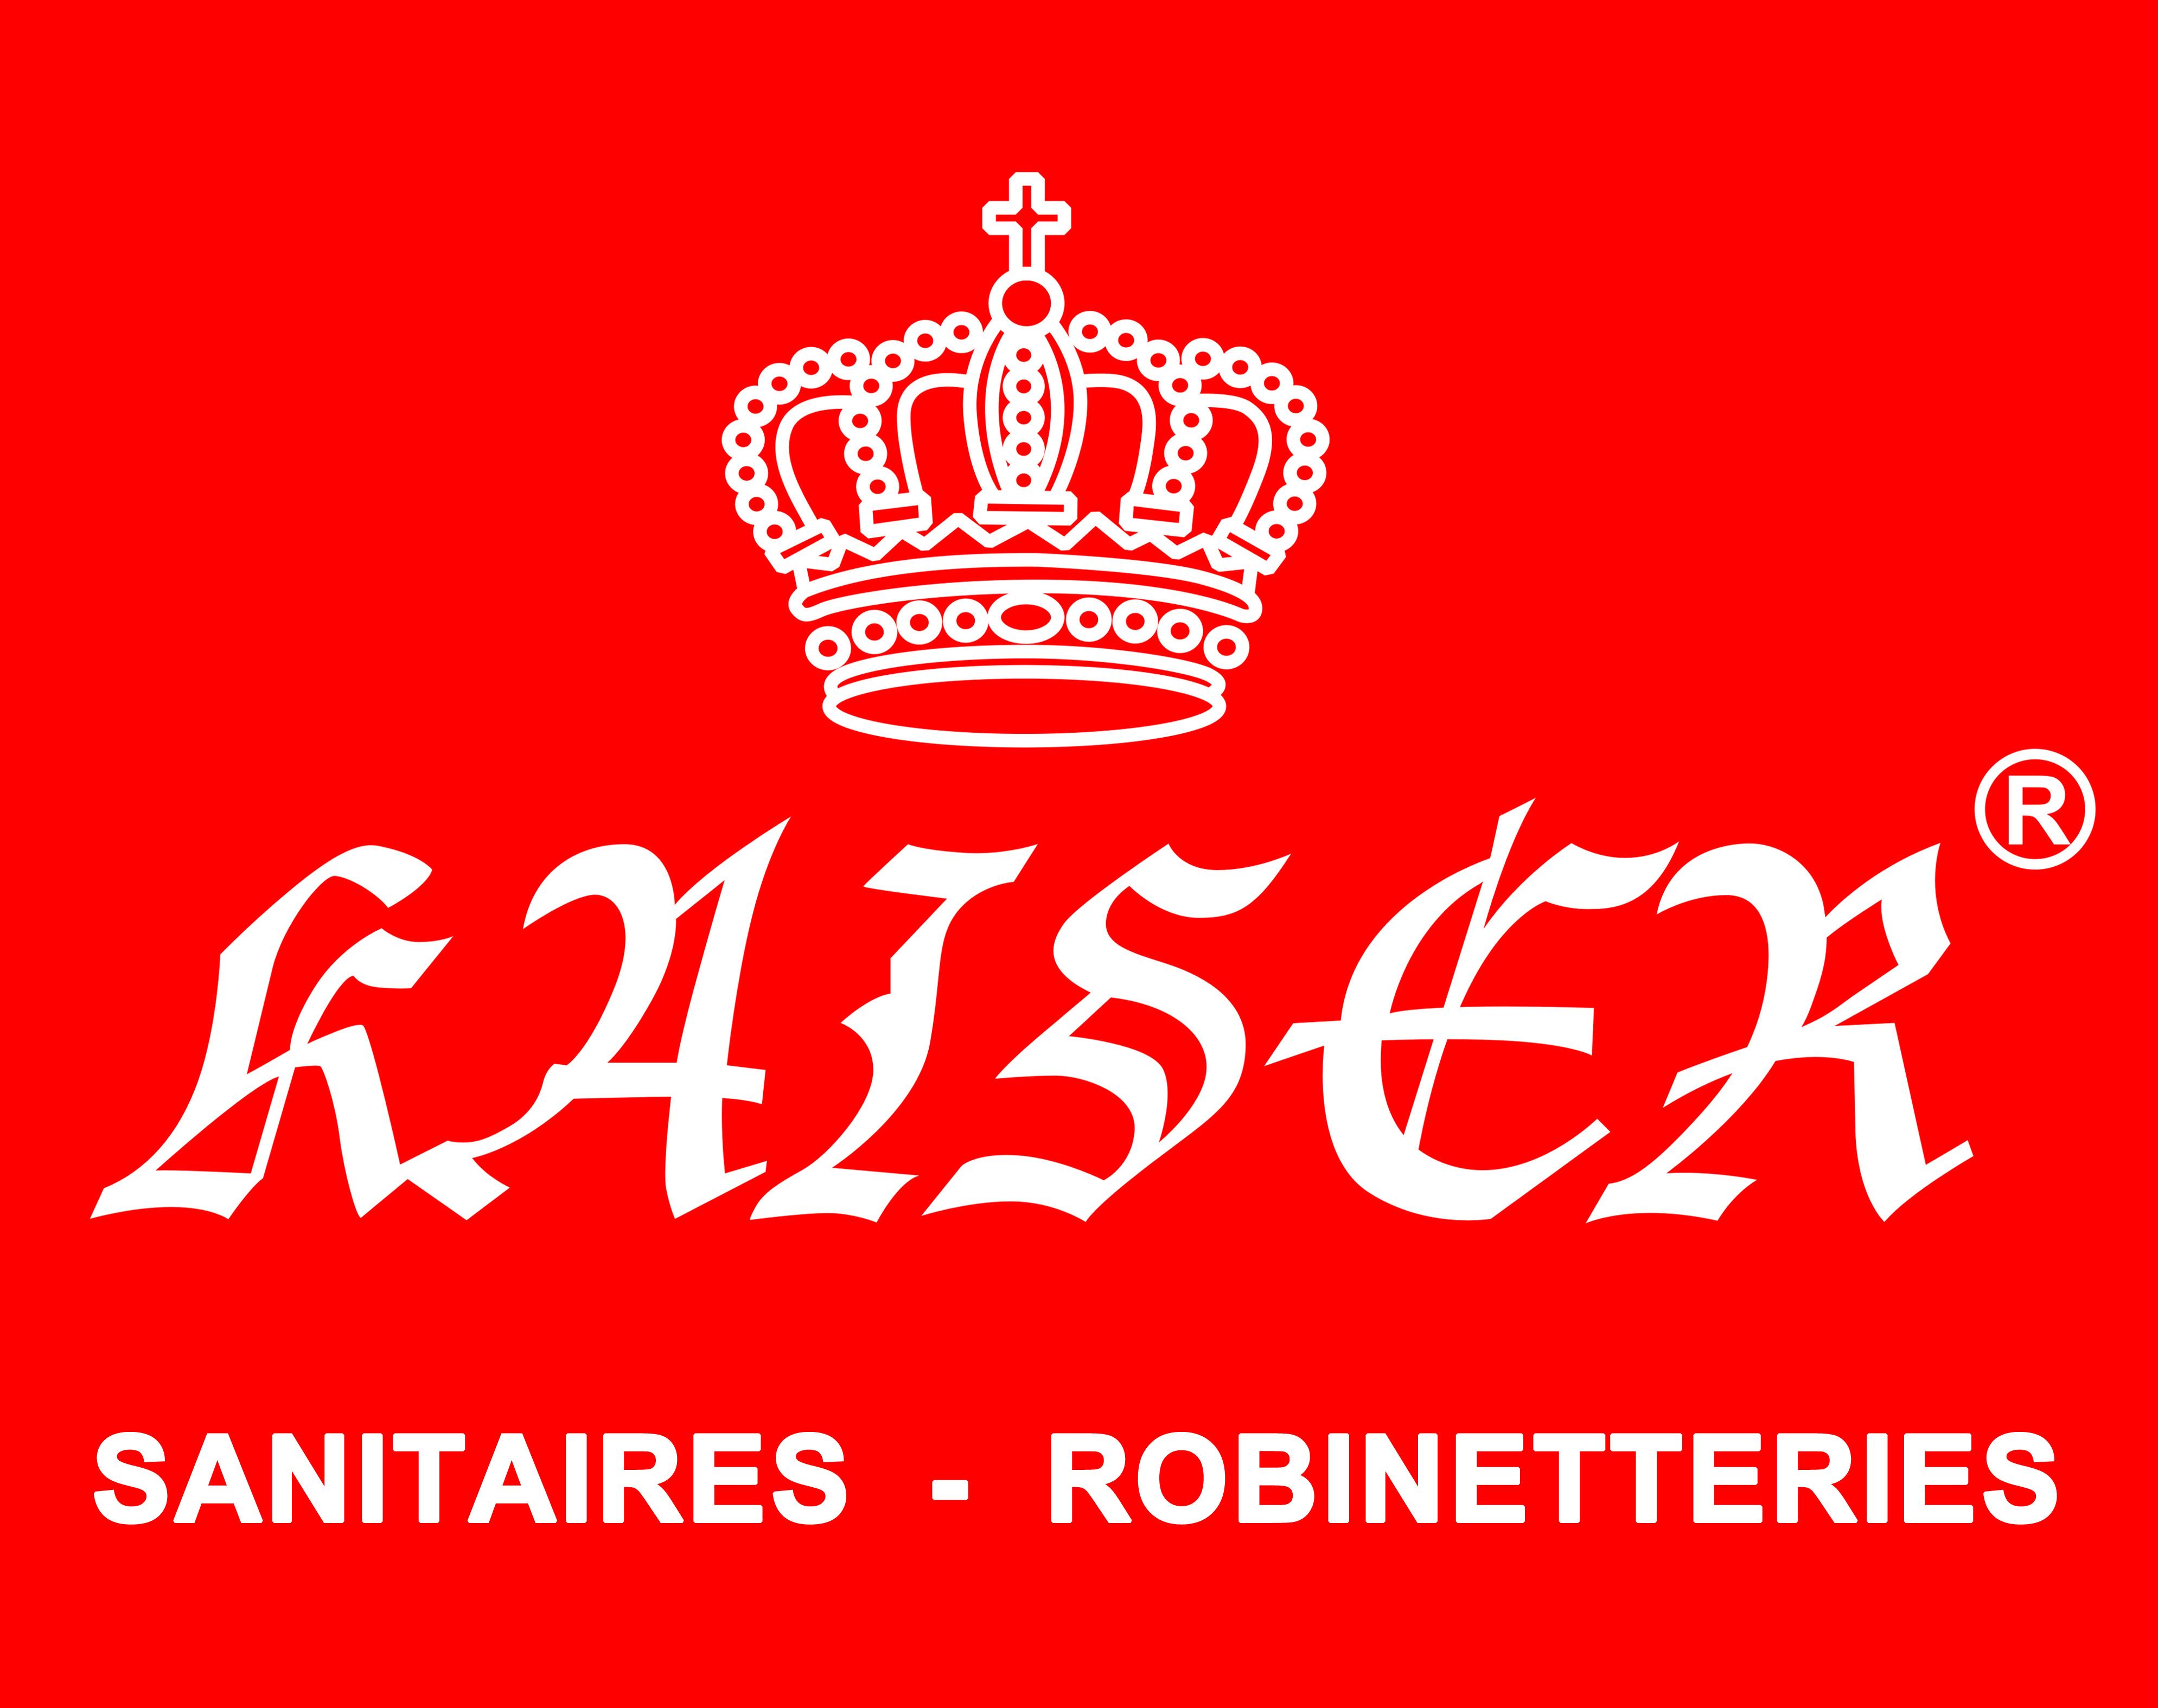 KAISER SANITAIRES